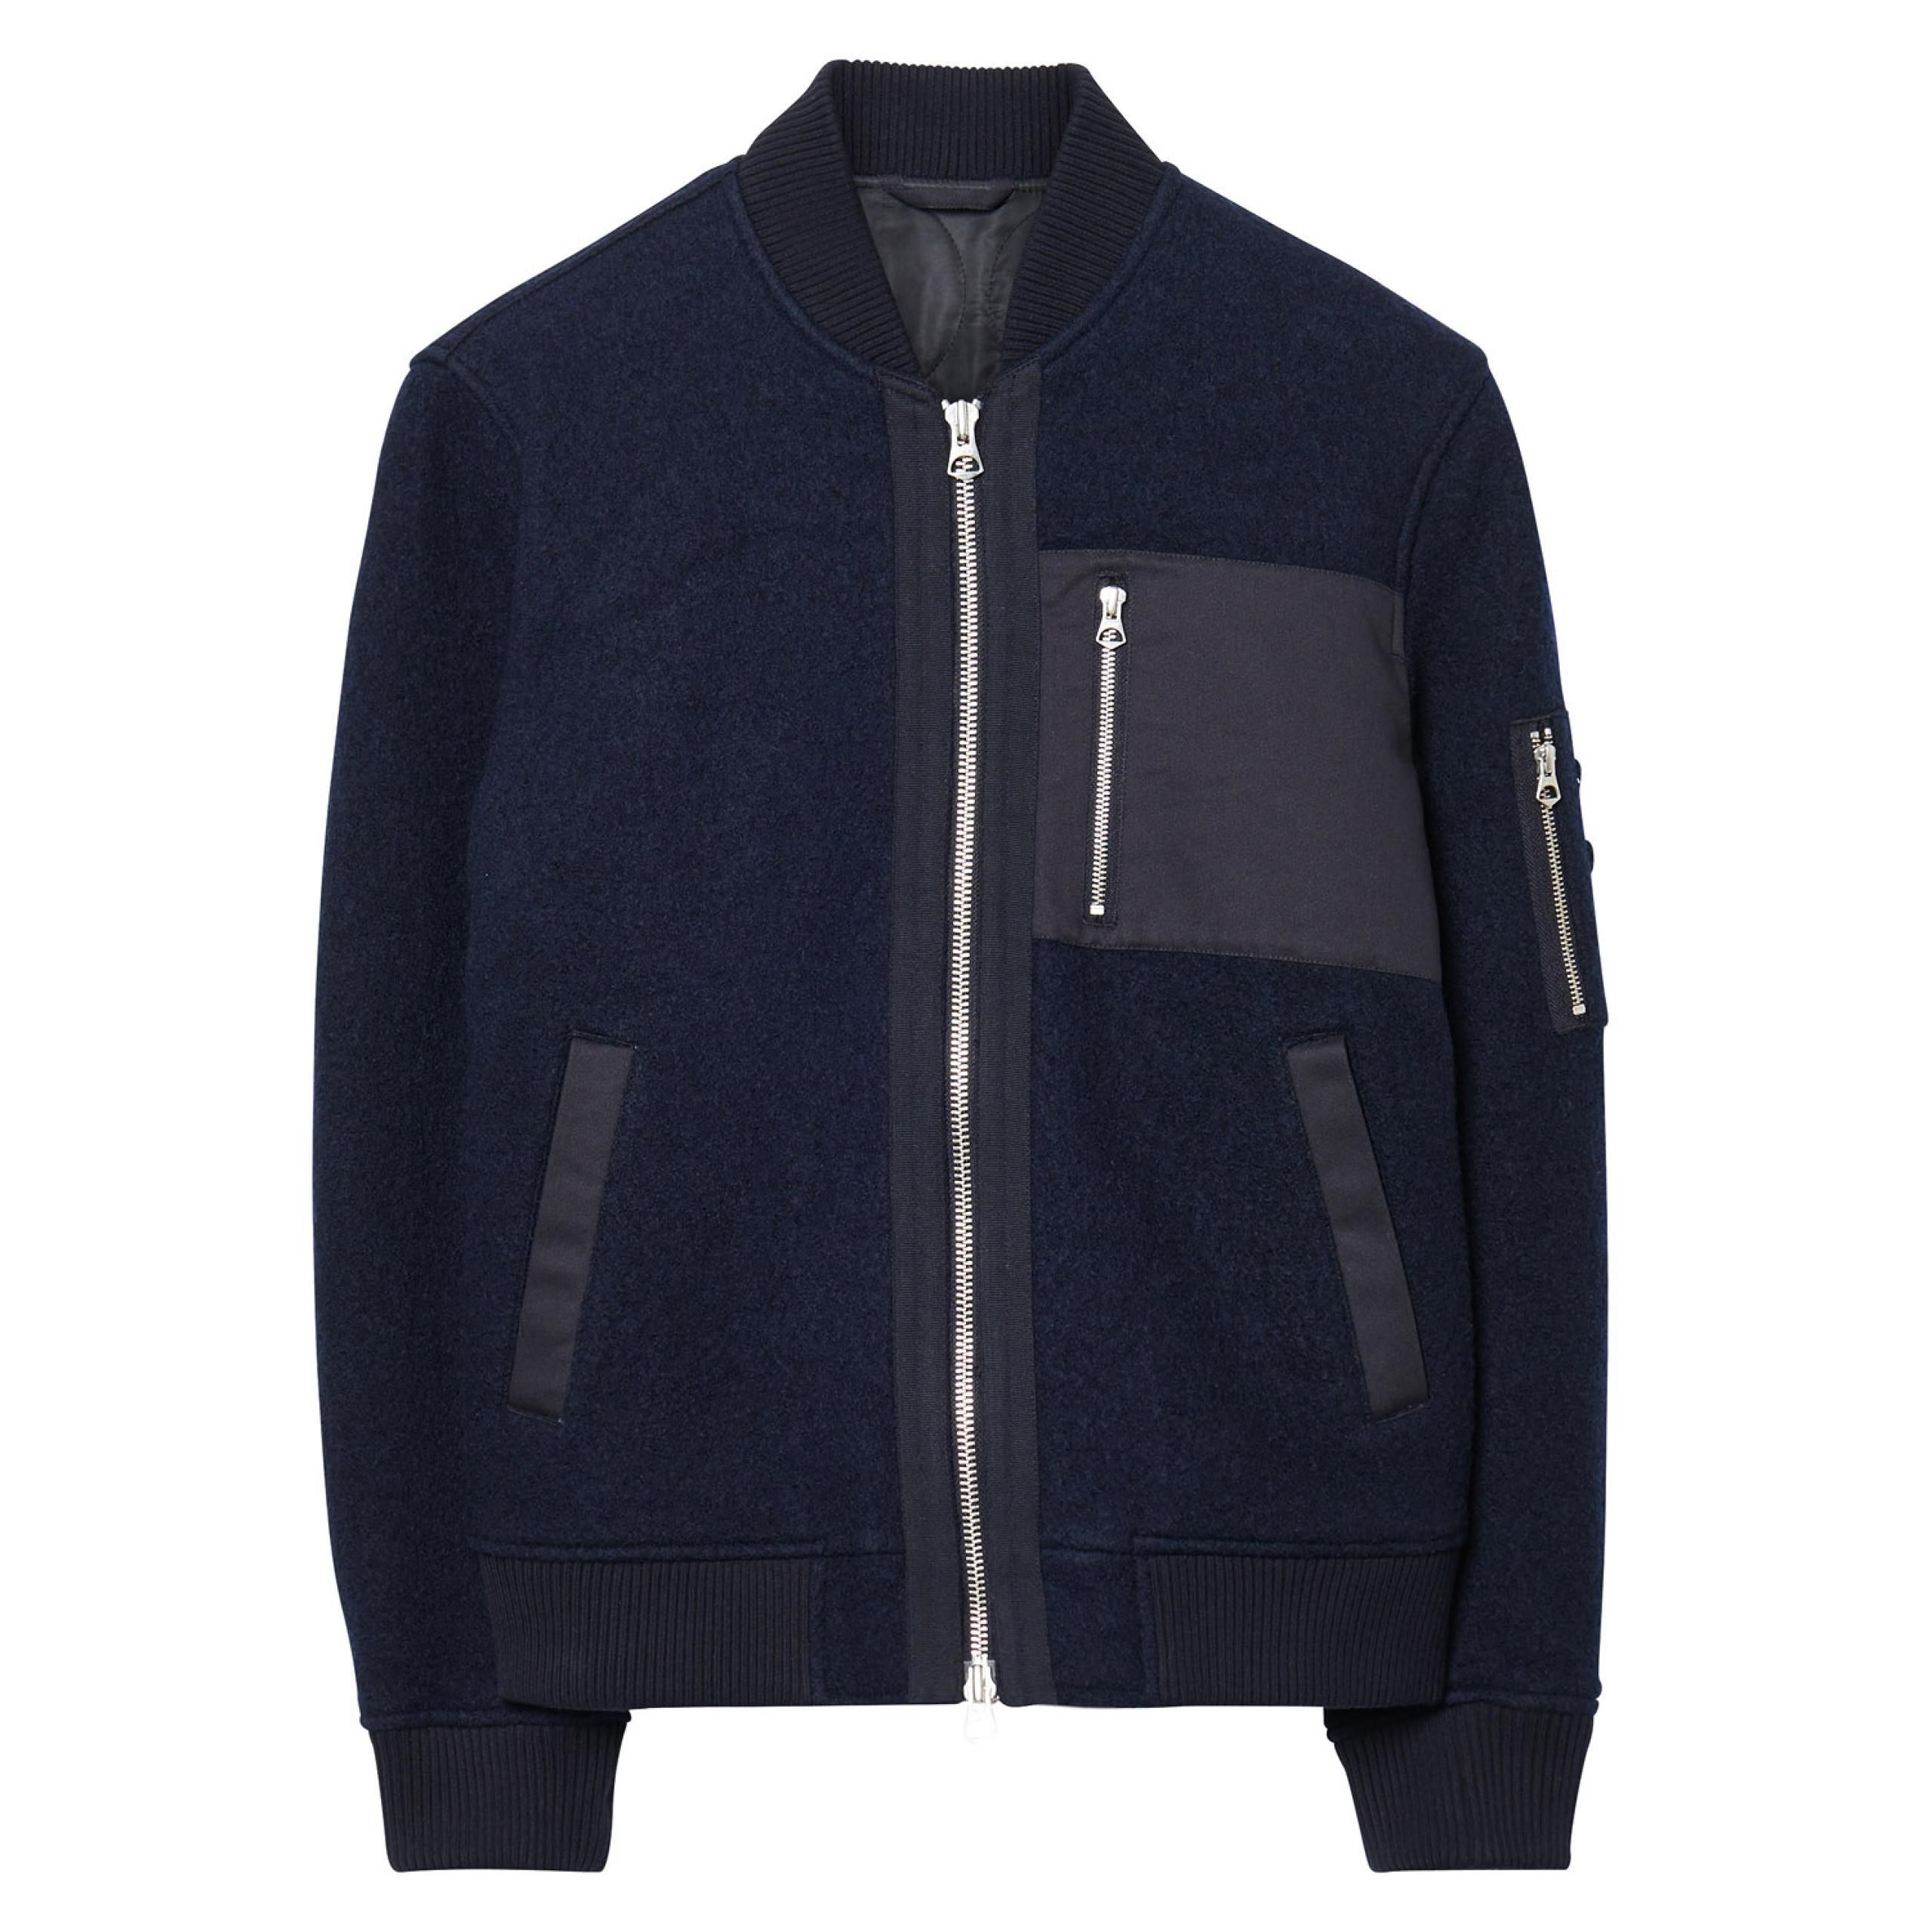 GANT Rugger: Blue Wooly Bomber Jacket Men's   GANT USA Store ...